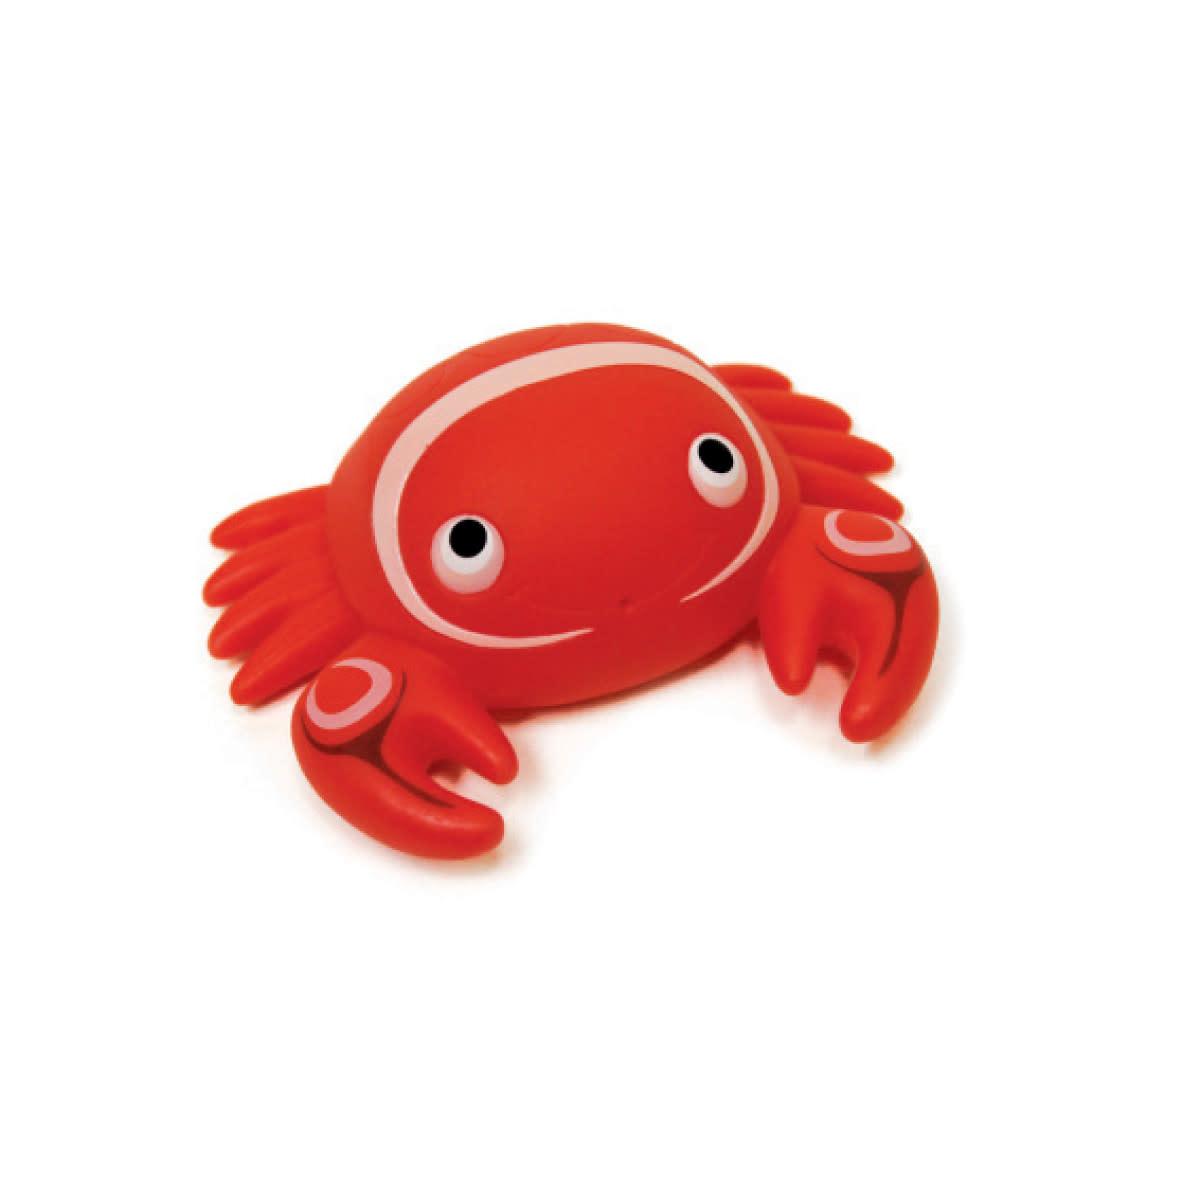 Bath Toy - Crab by Ryan Cranmer-1